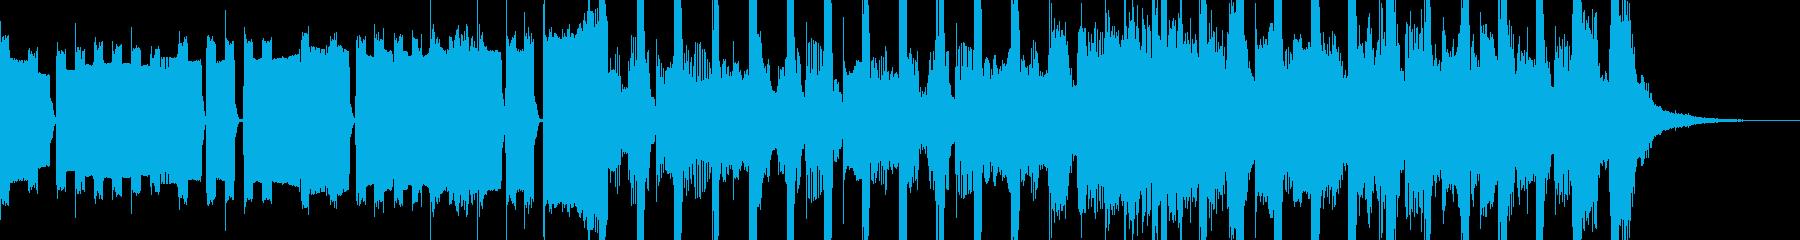 Electro-Dub Step ...の再生済みの波形